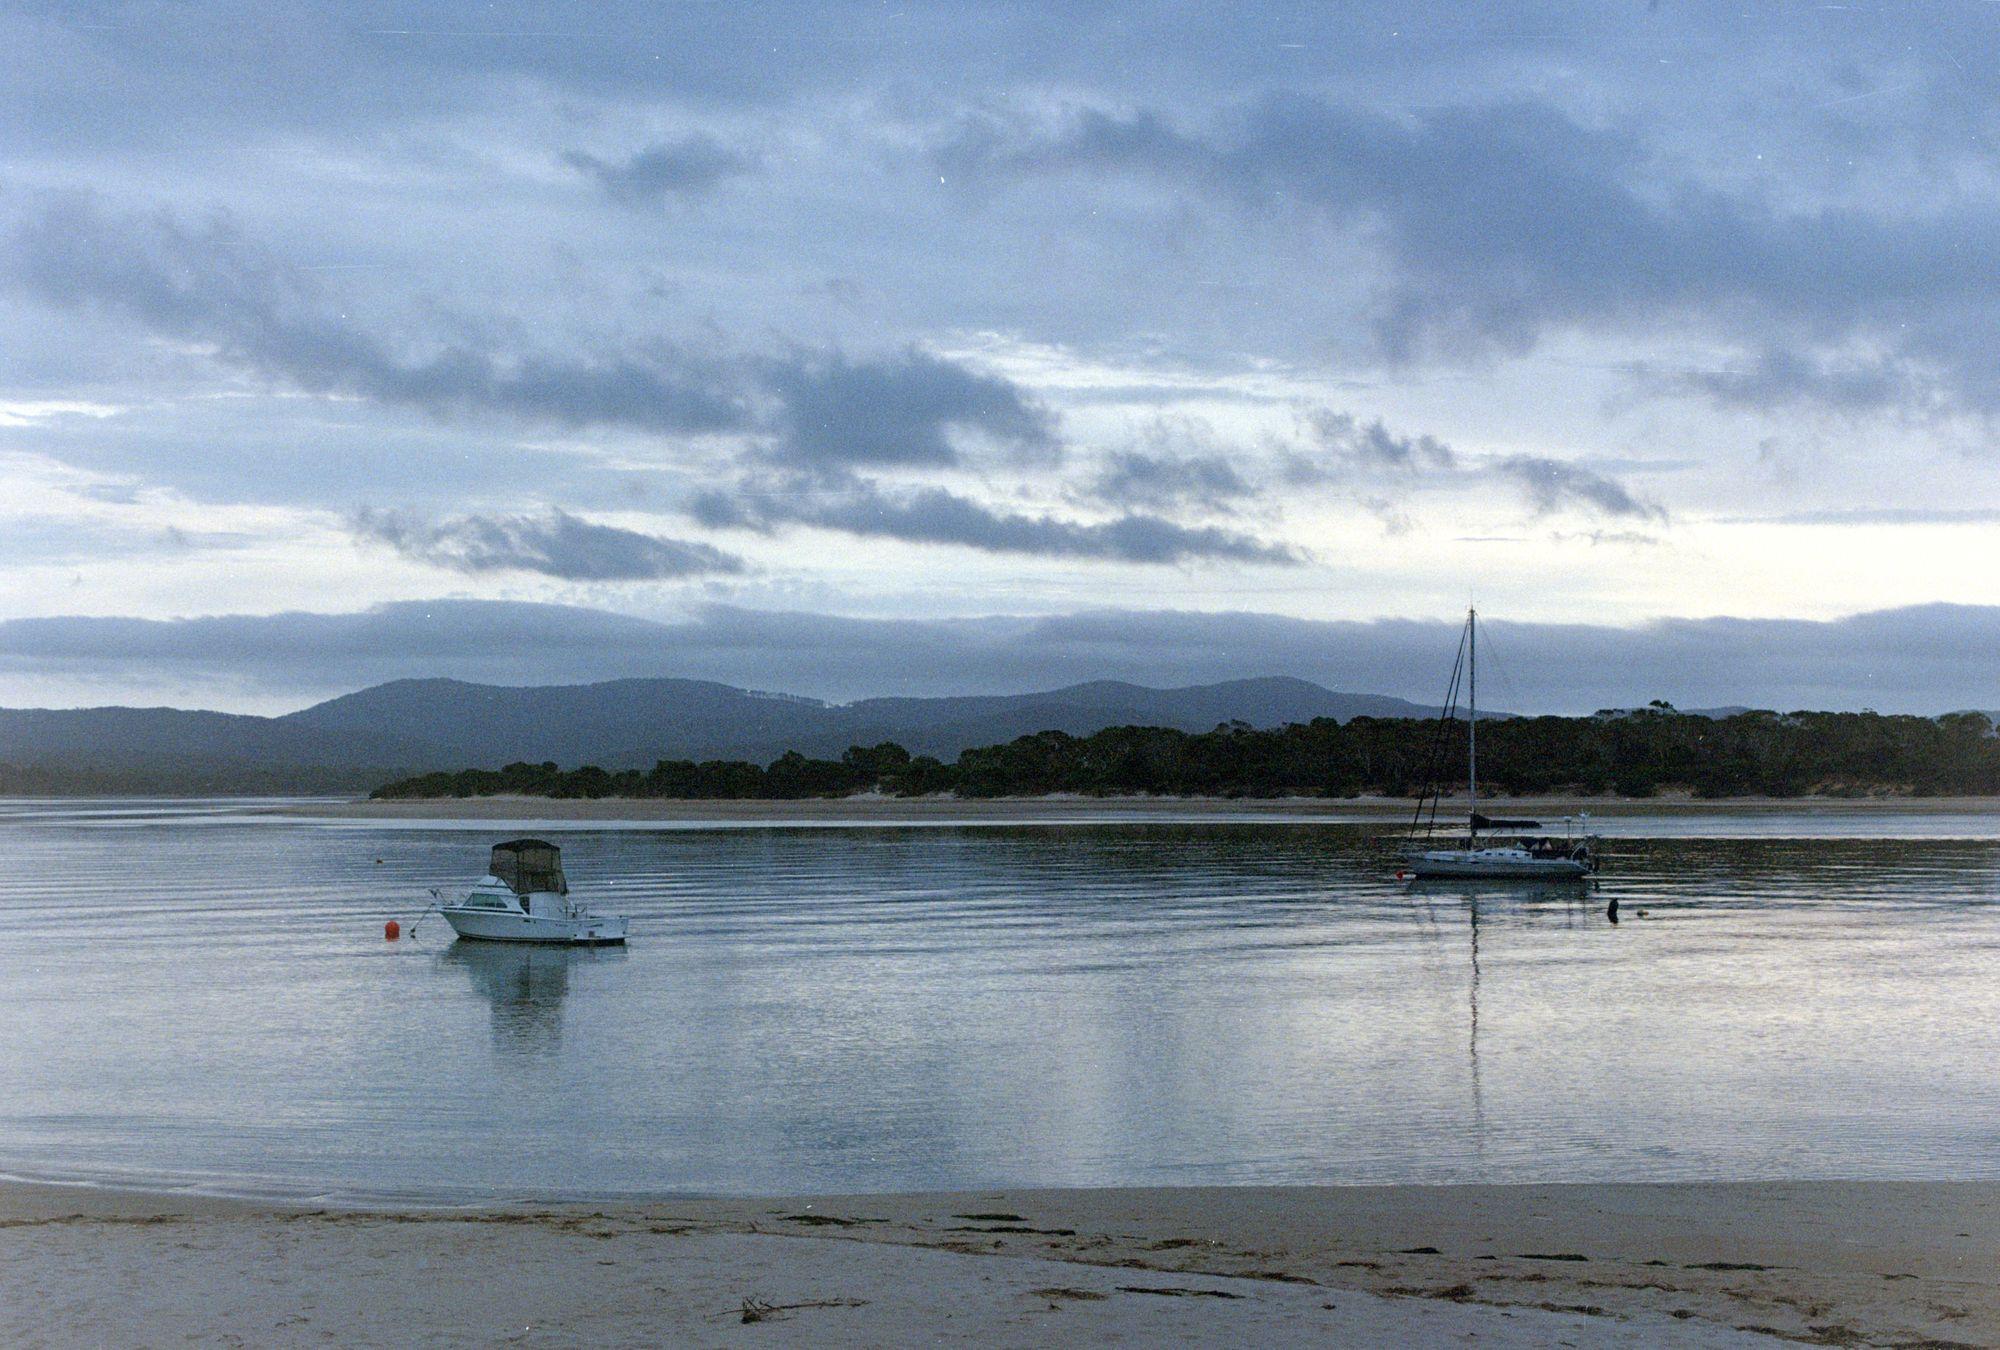 Photos from Port Sorell